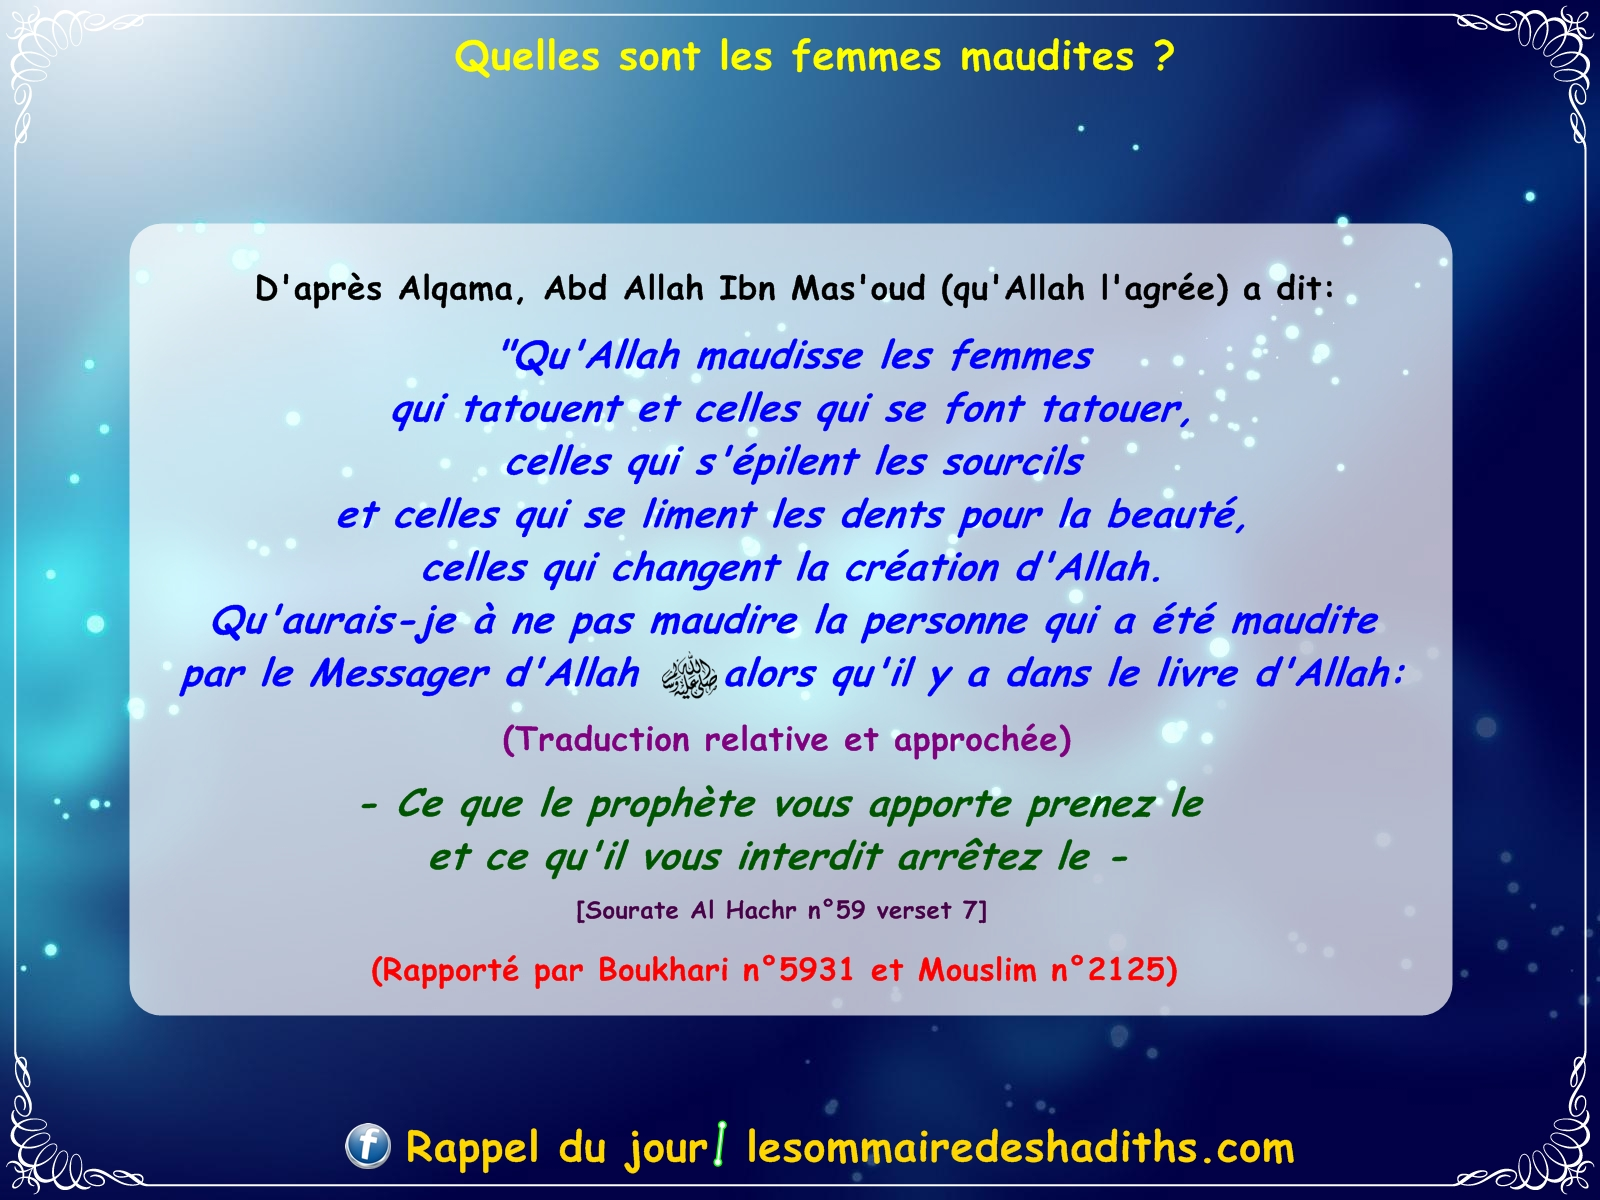 Les femmes maudites (Abd Allah Ibn Mas'oud)